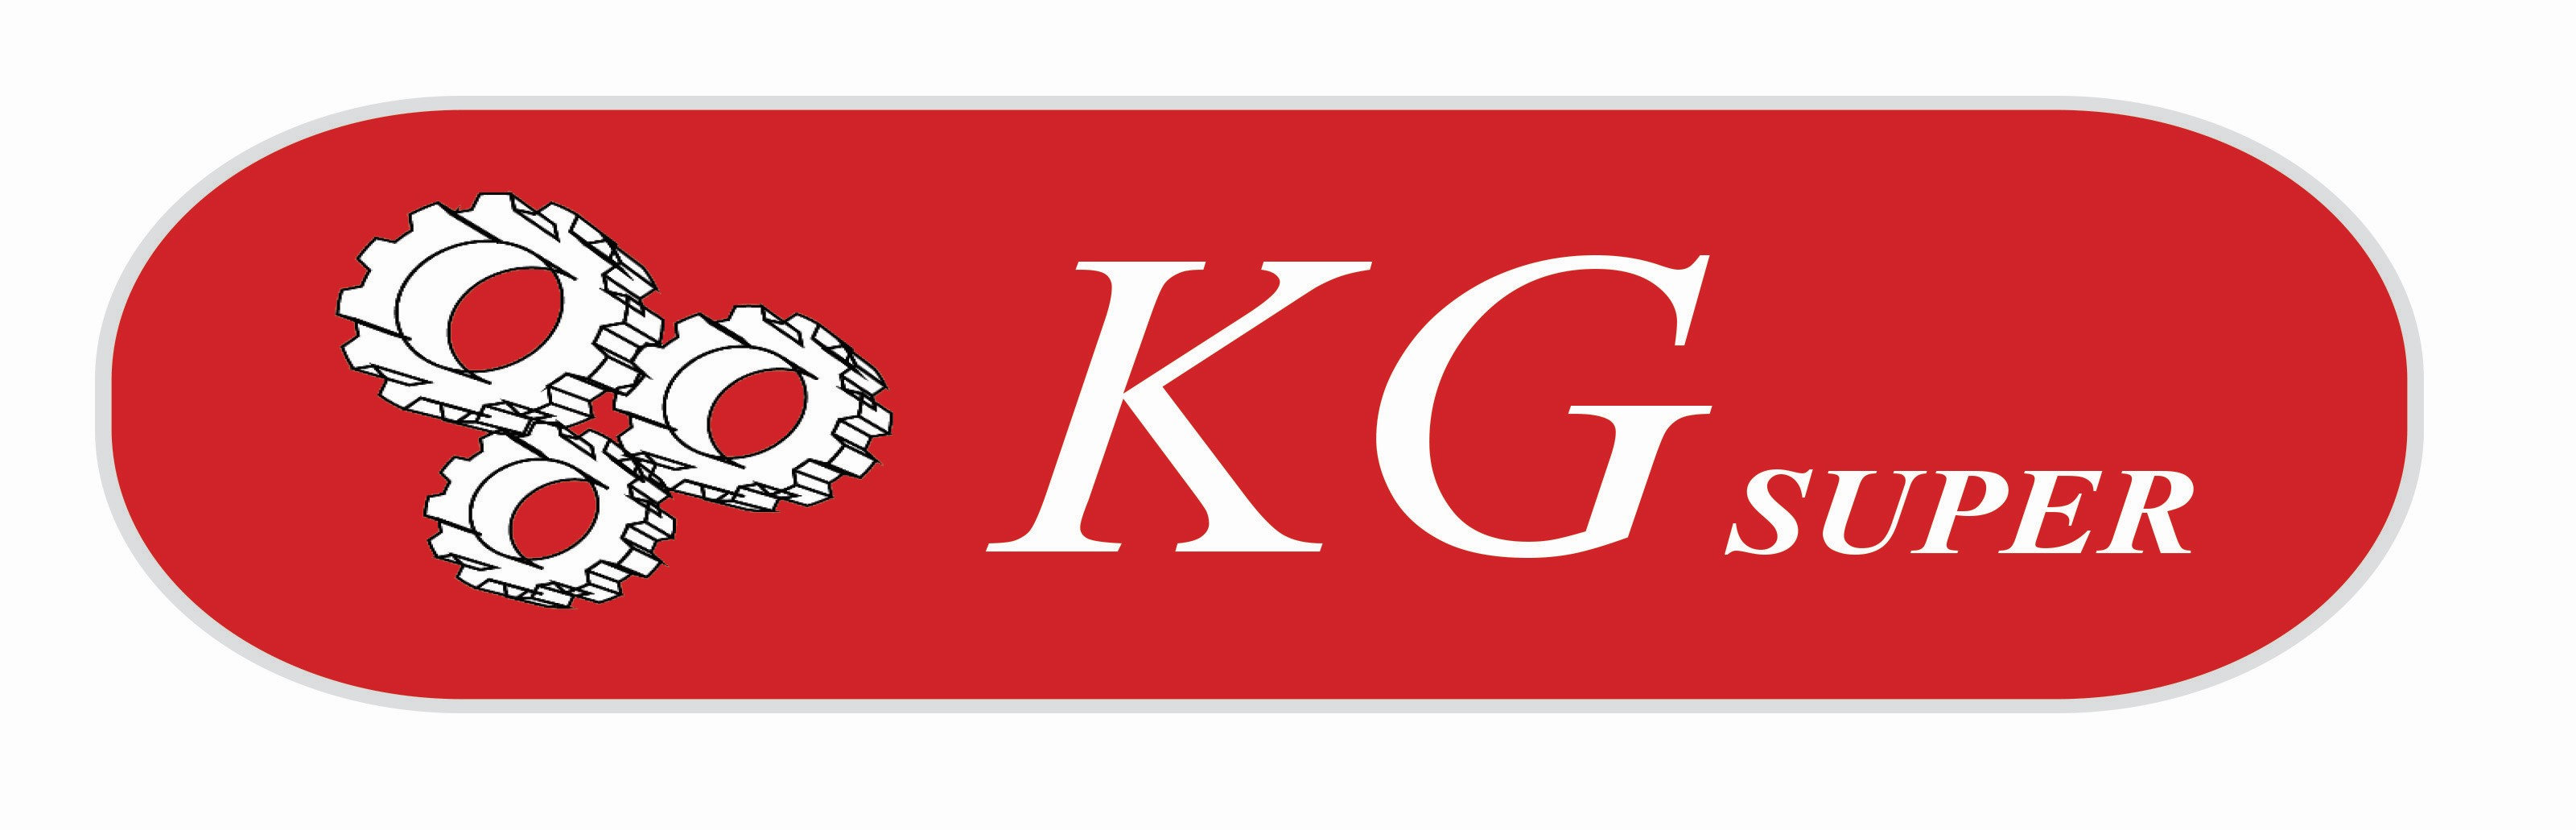 KG SUPER